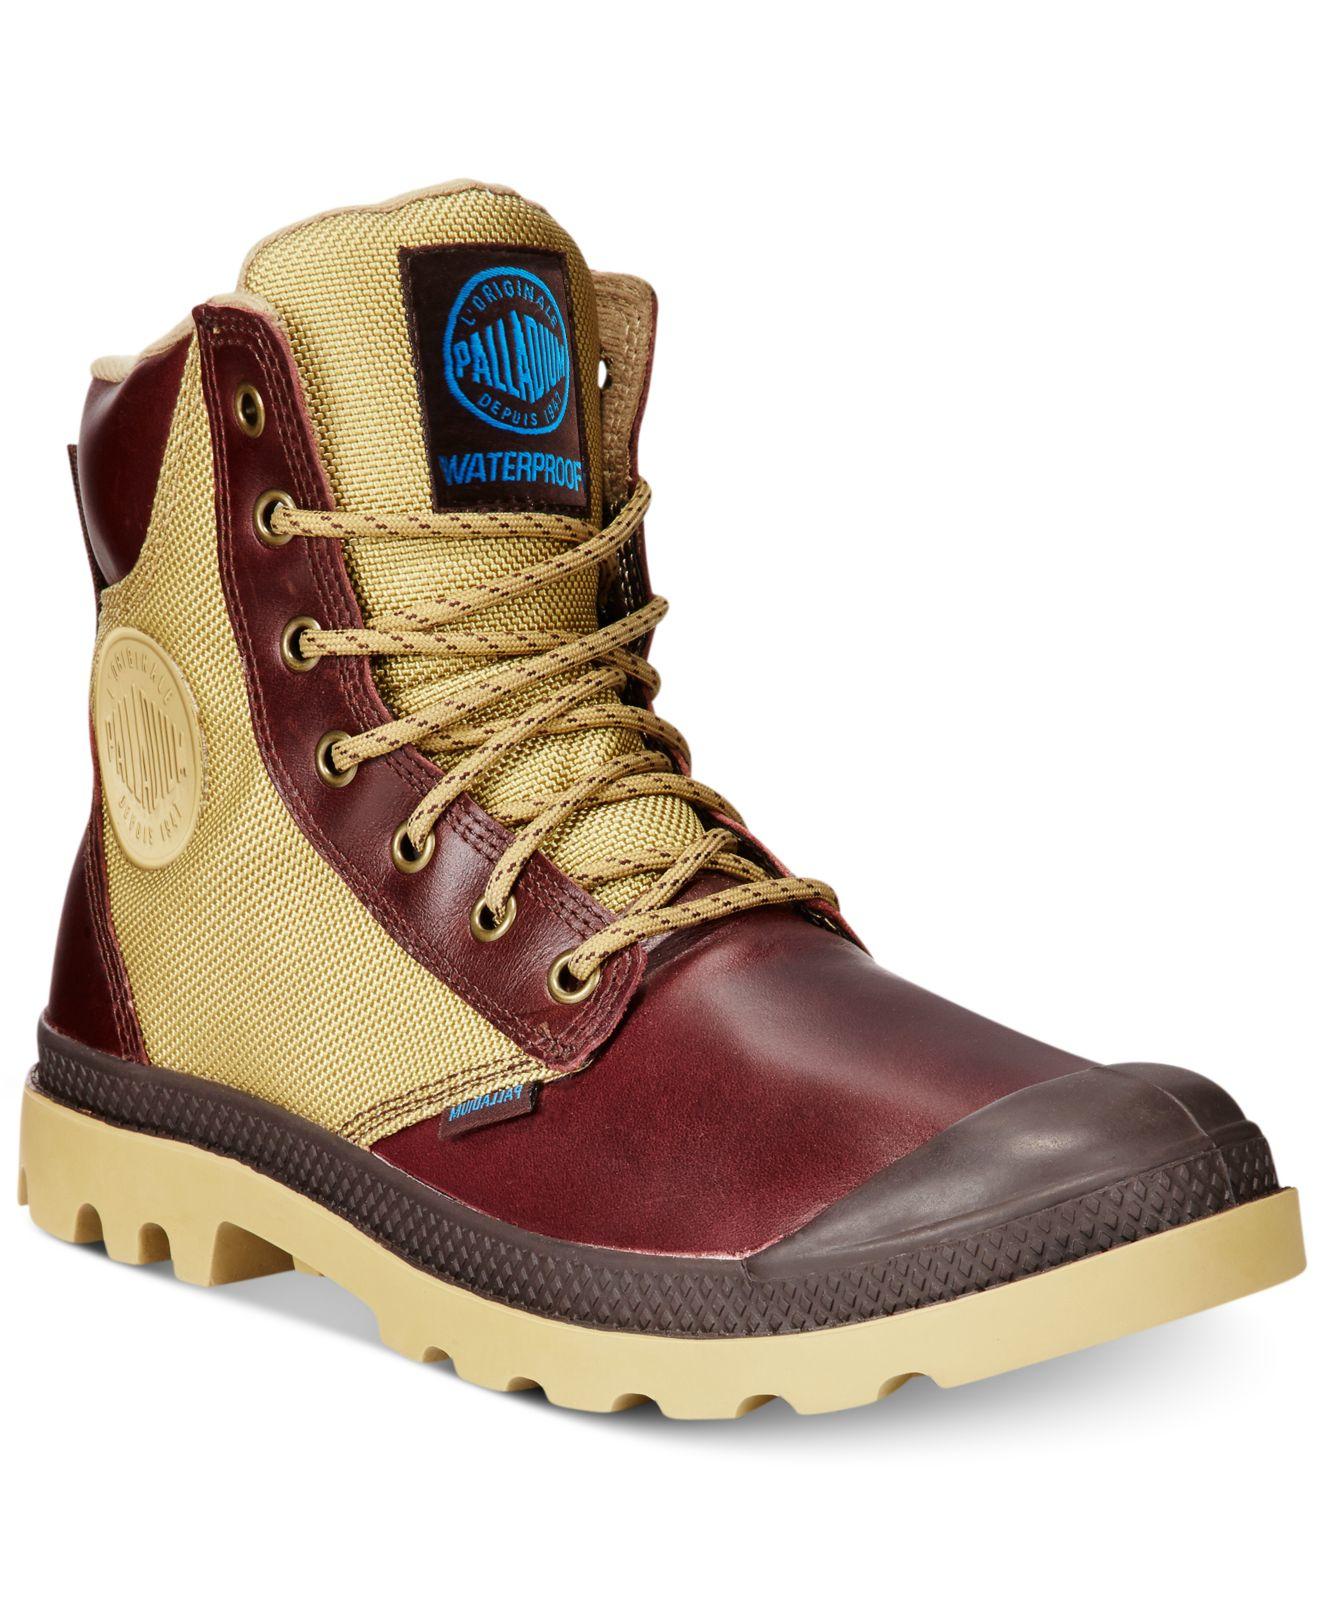 Lyst Palladium Pampa Sport Cuff Waterproof Boots In